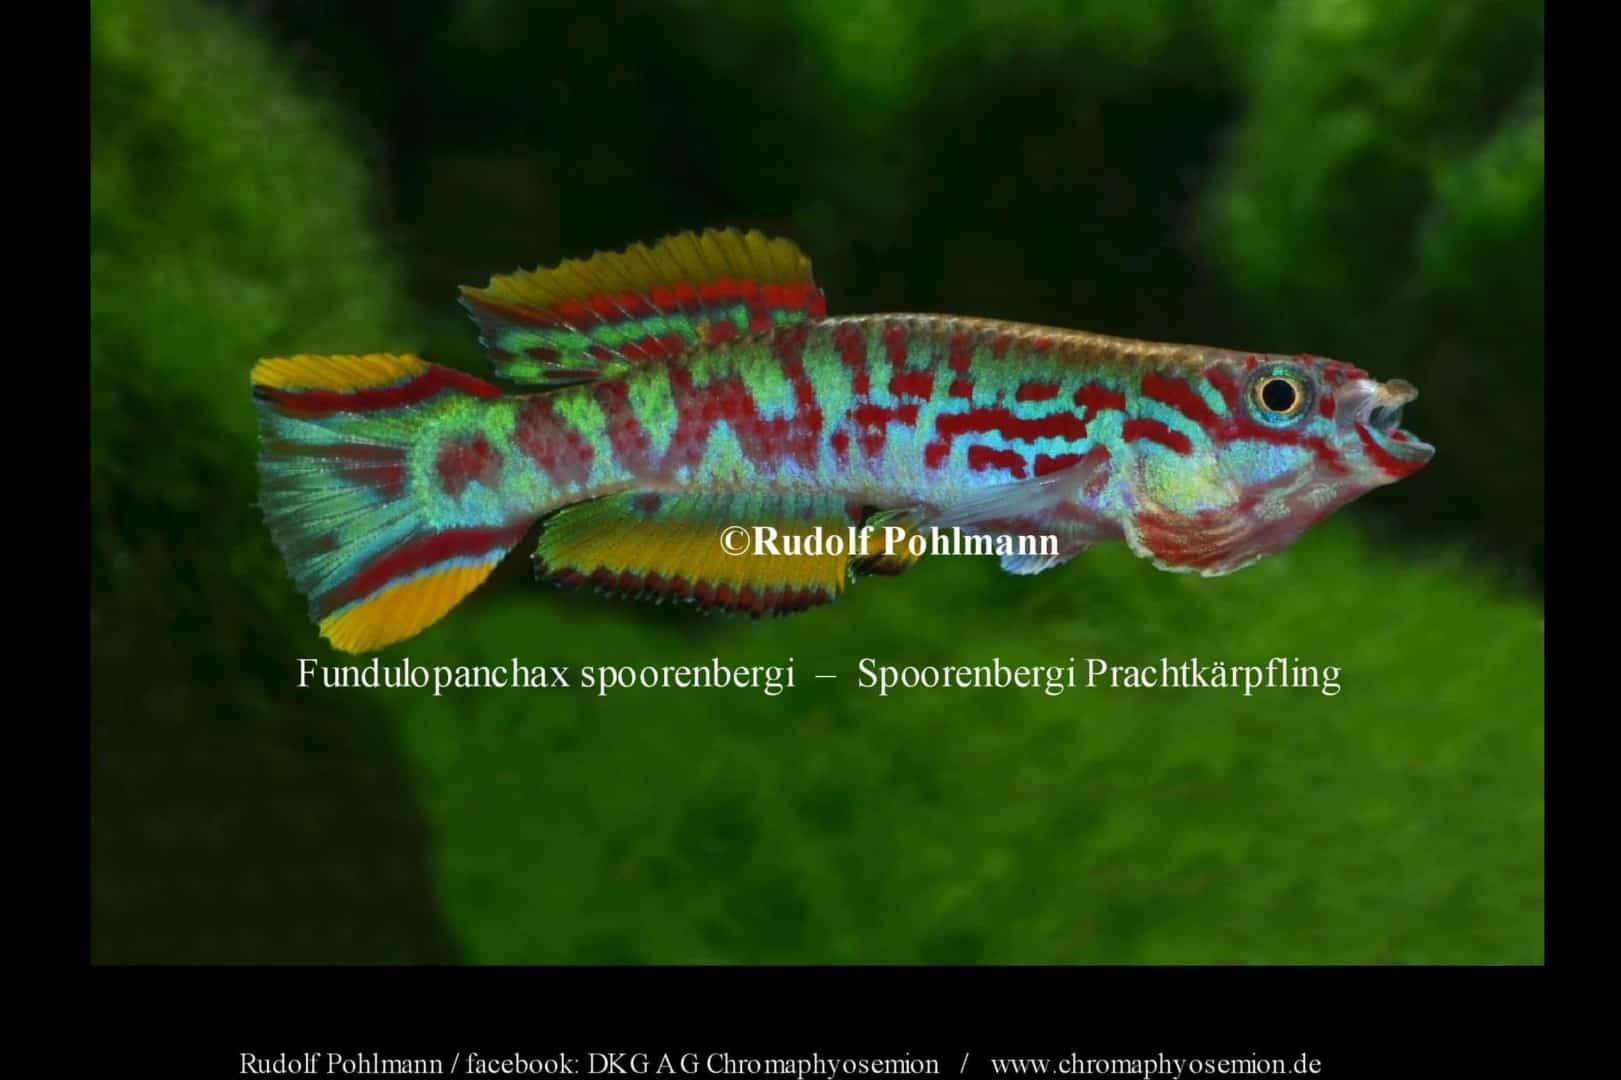 Fundulopanchax spoorenbergi – Spoorenbergi Prachtkärpfling 1